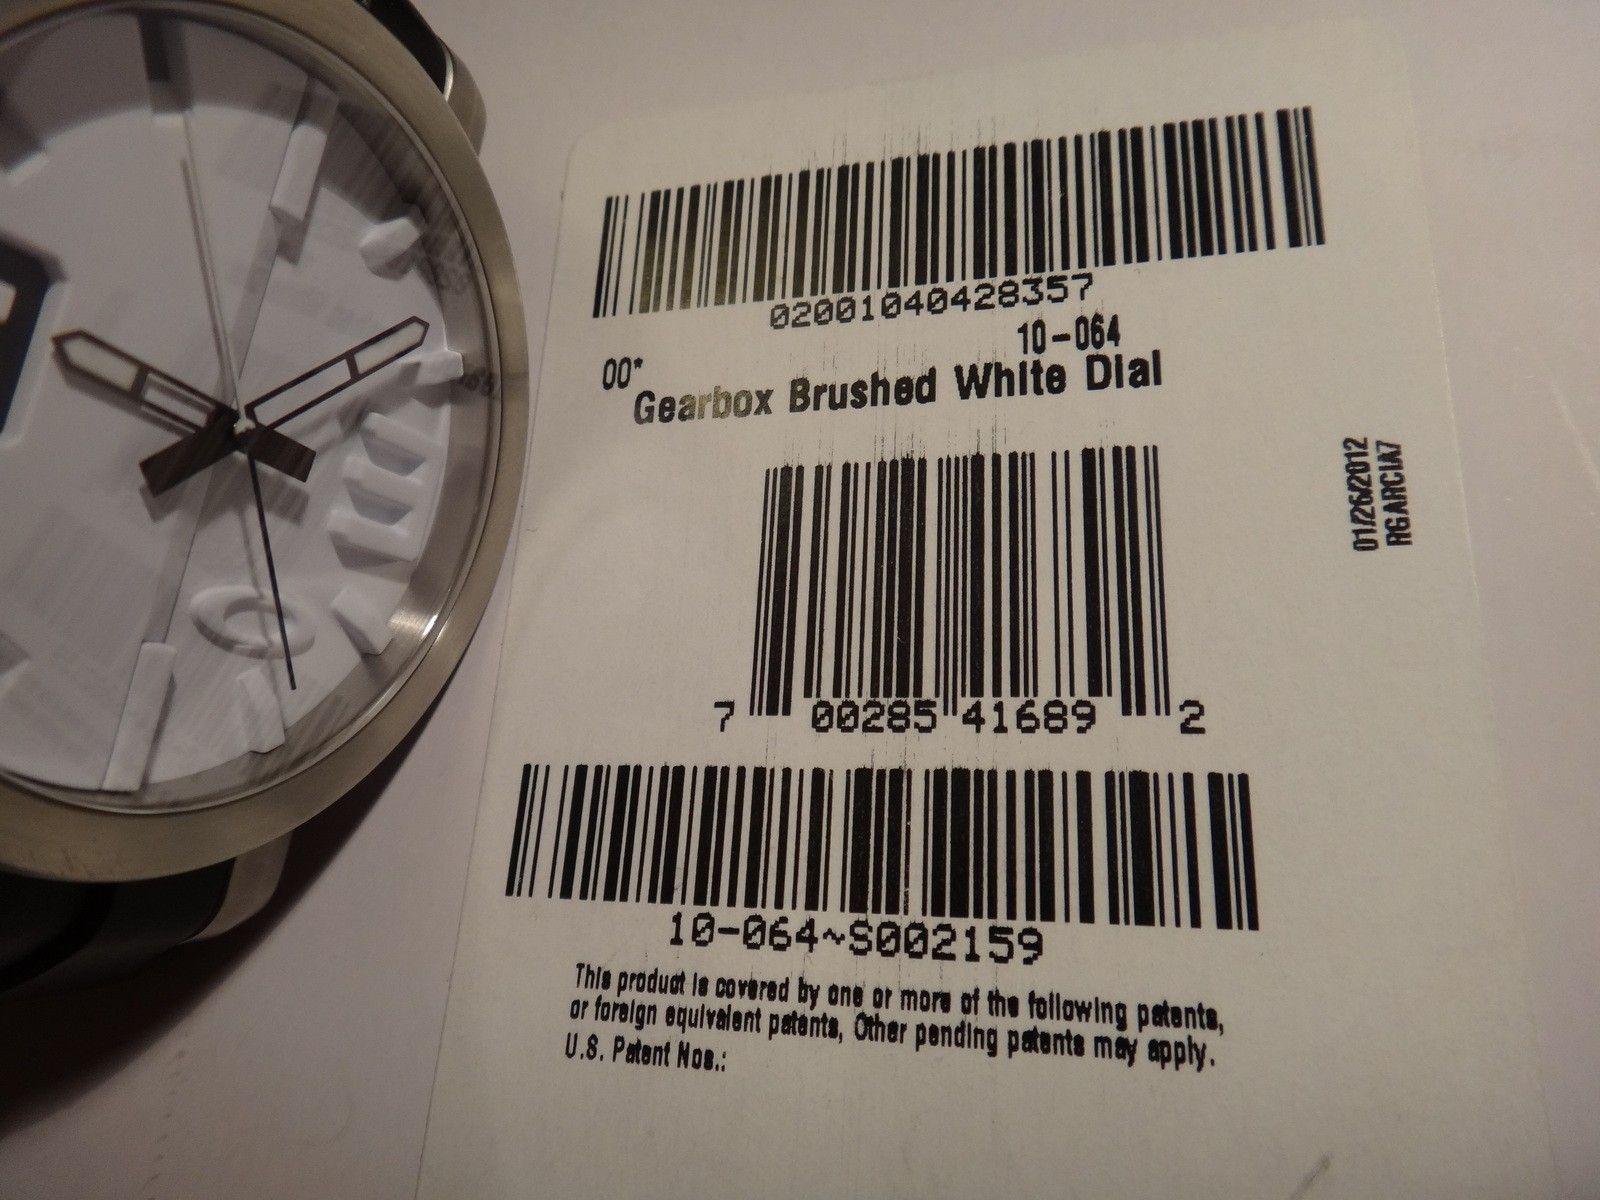 Oakley Gearbox brushed WHITE dial 10-064 stainless steel - DSC05725.JPG